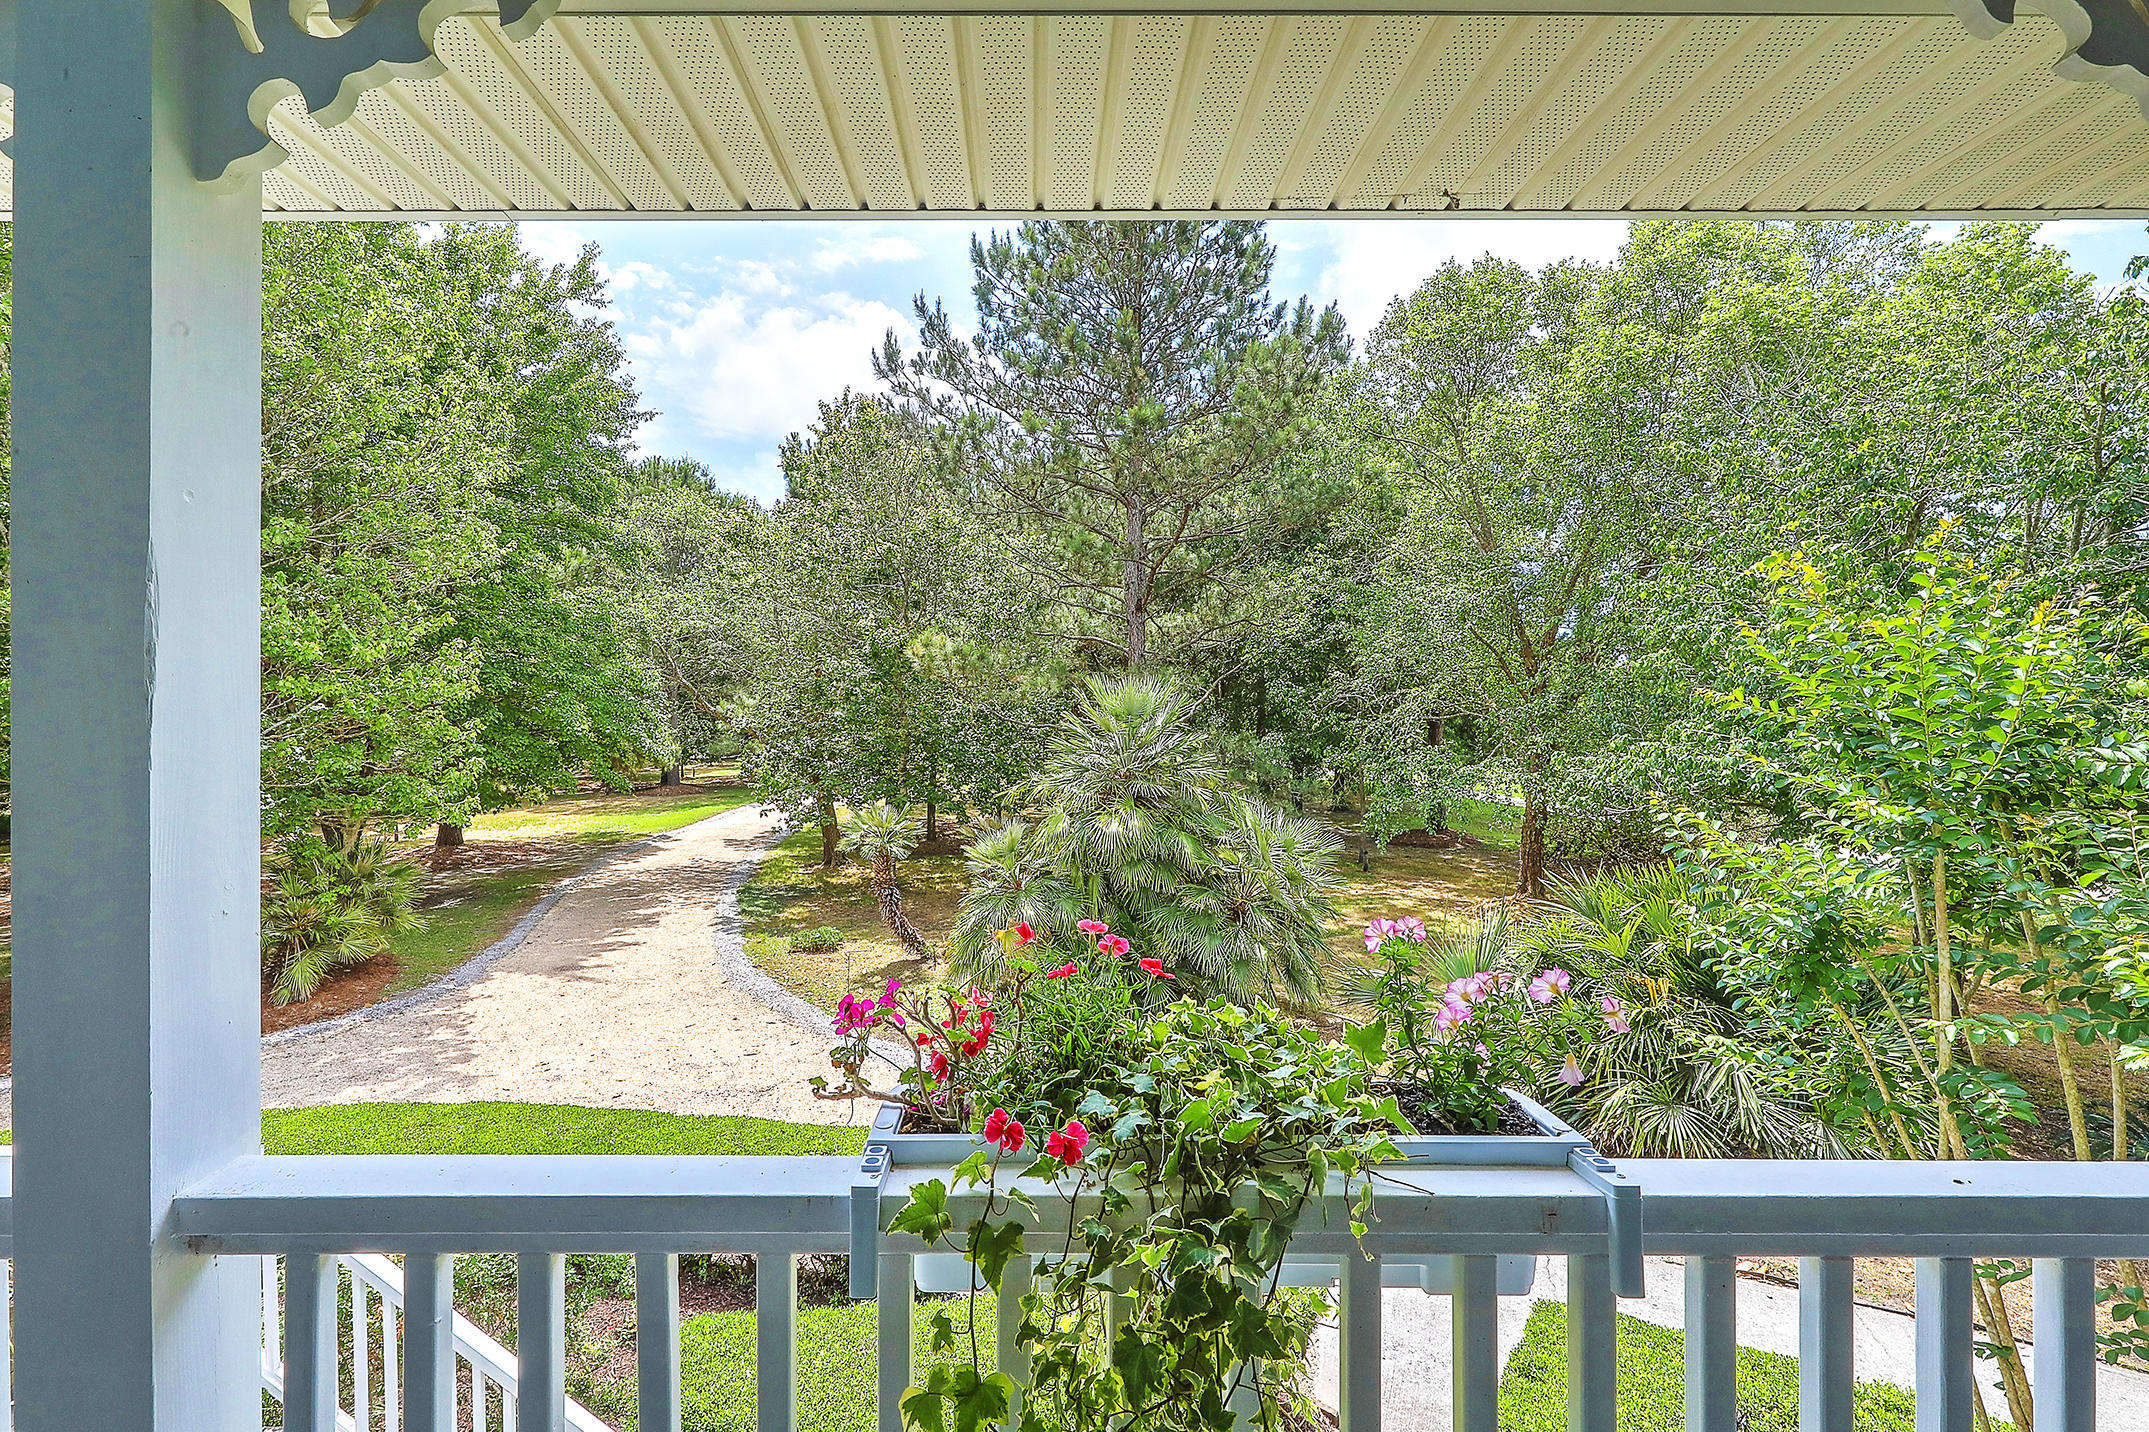 Stono Pointe Homes For Sale - 2660 Burden Creek, Johns Island, SC - 53